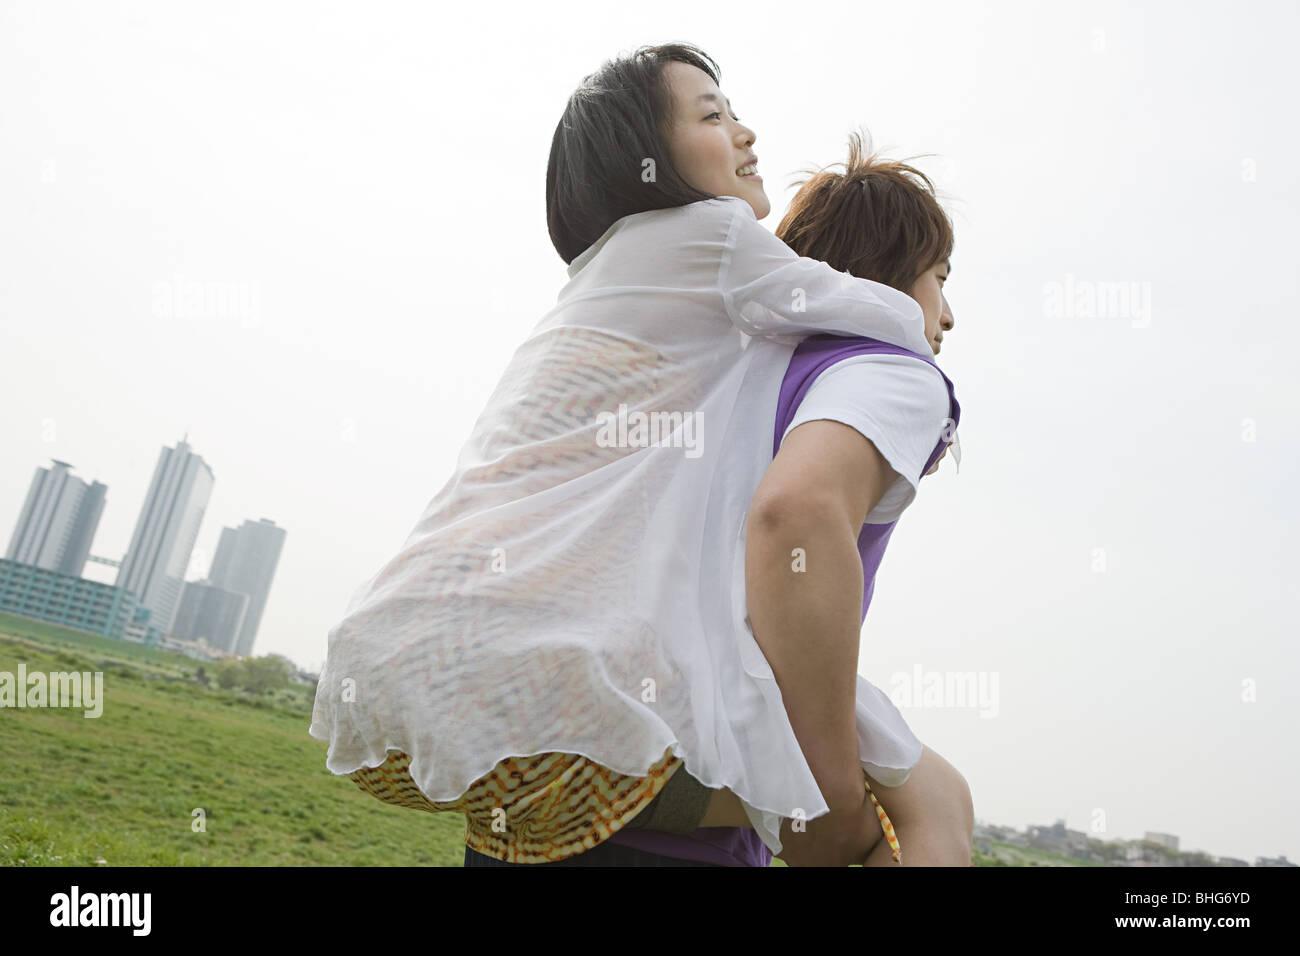 Young man giving girlfriend piggyback - Stock Image